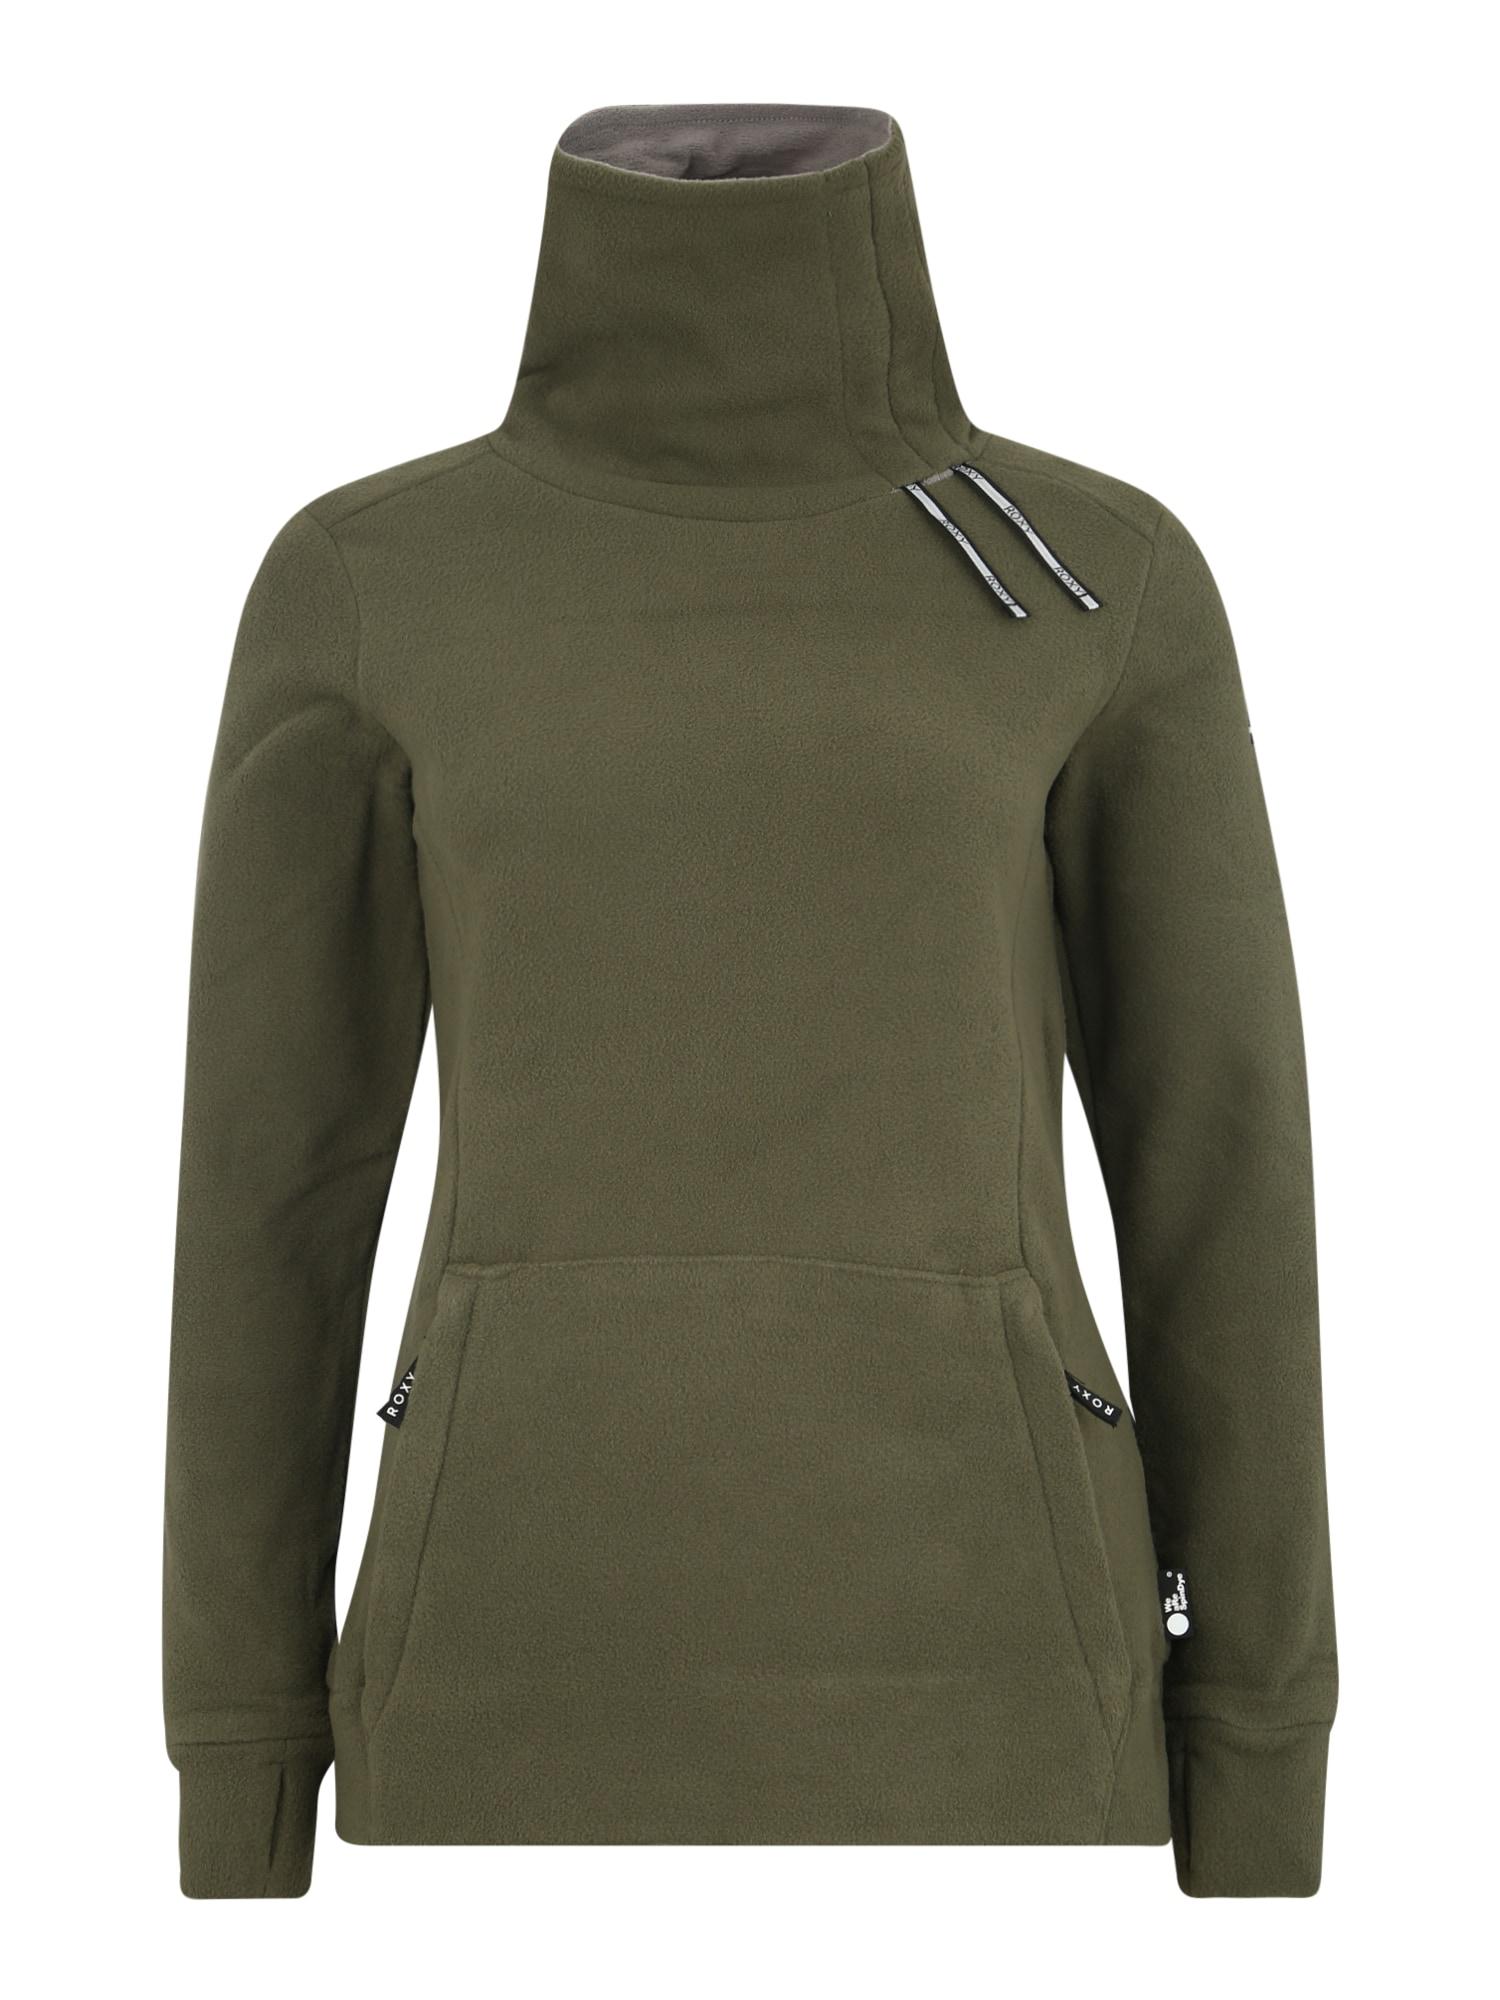 ROXY Sportinio tipo megztinis 'DELTINE SPINDYE J OTLR' rusvai žalia